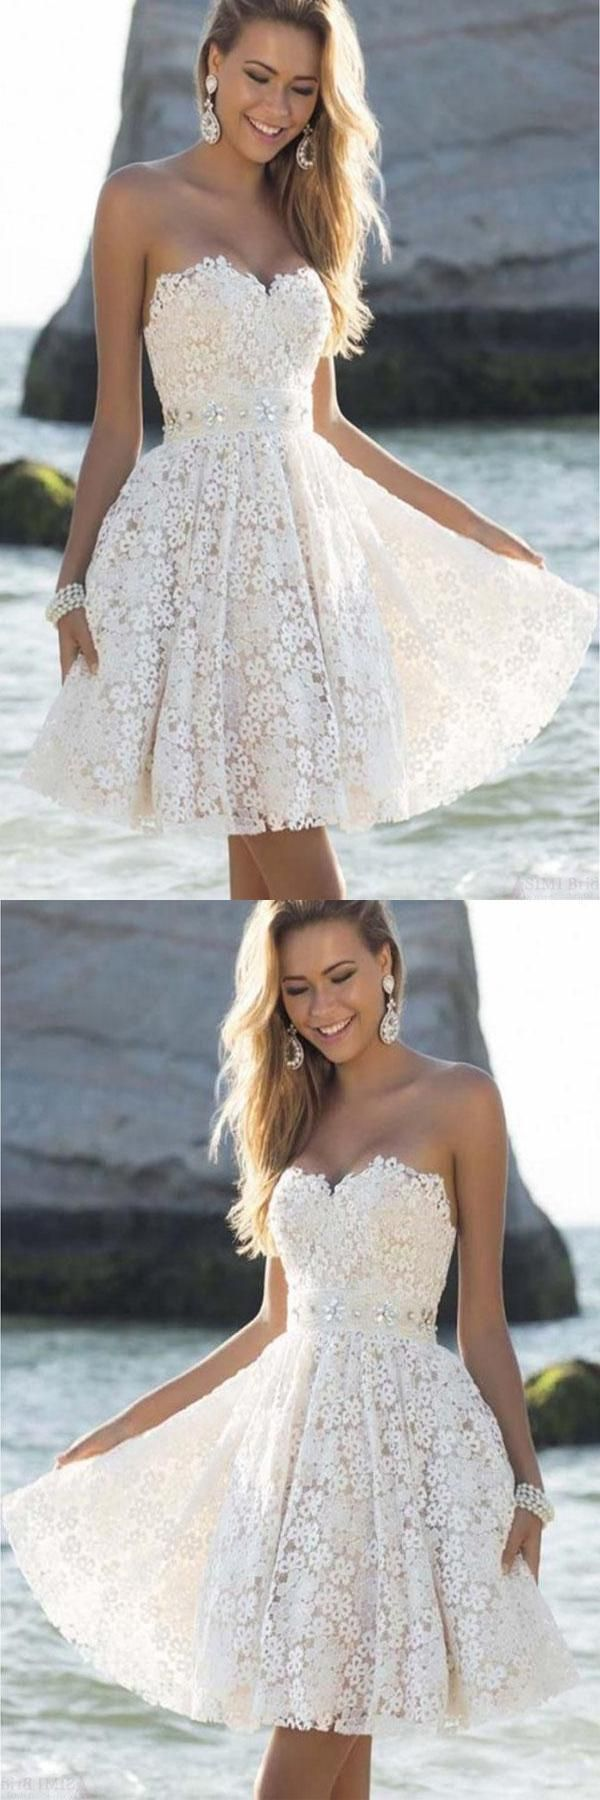 Short homecoming dress prom dresses white prom dresses short